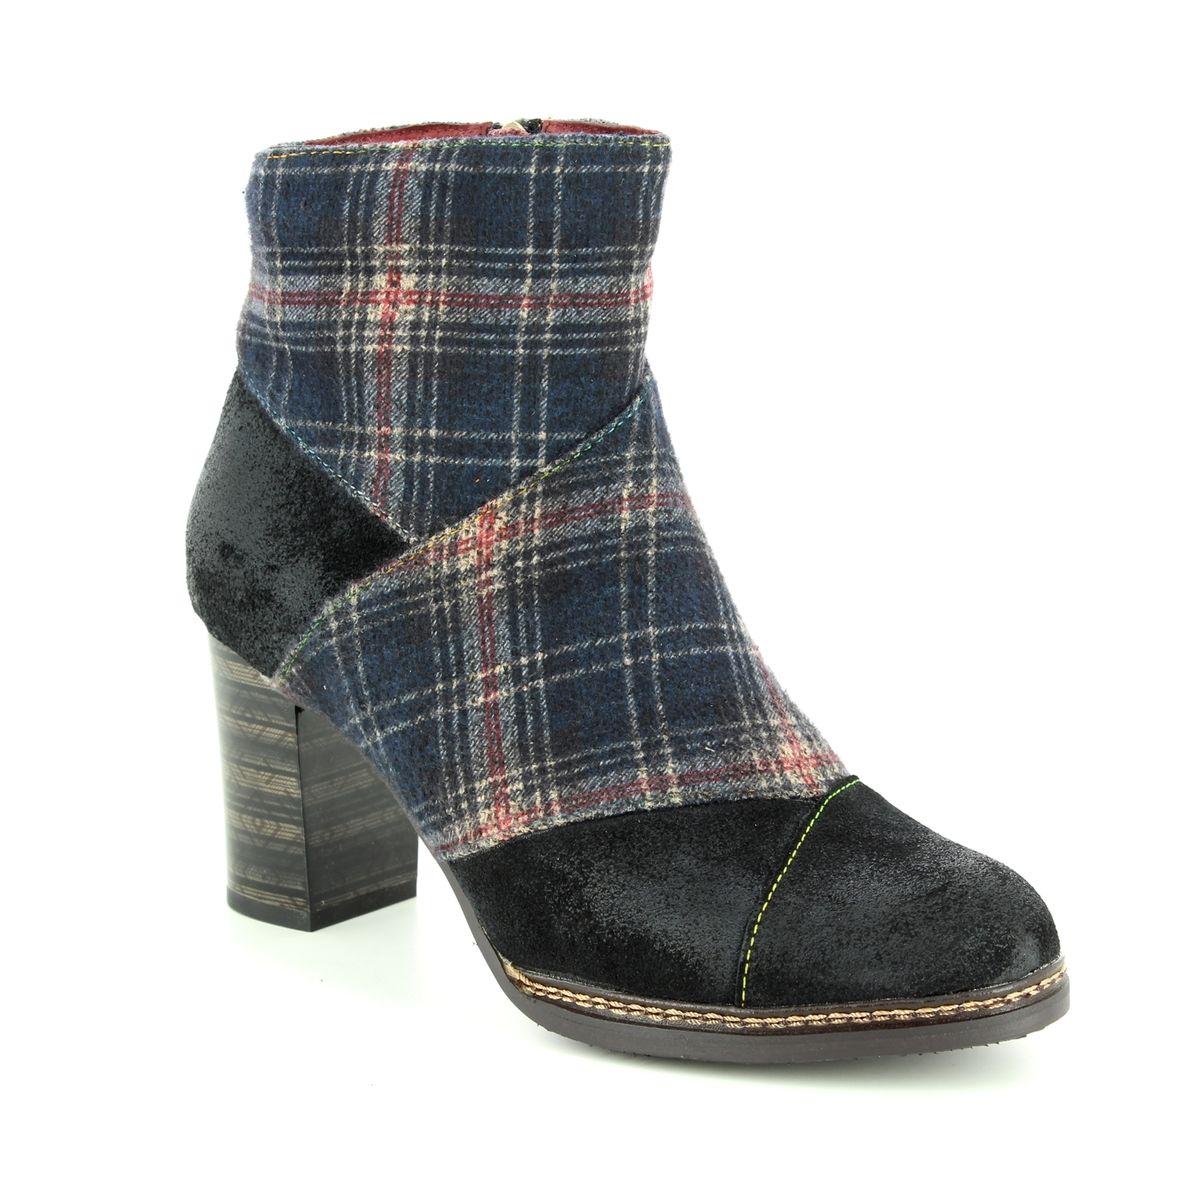 great variety models outlet deft design 8503/30 Elea 018 at Begg Shoes & Bags